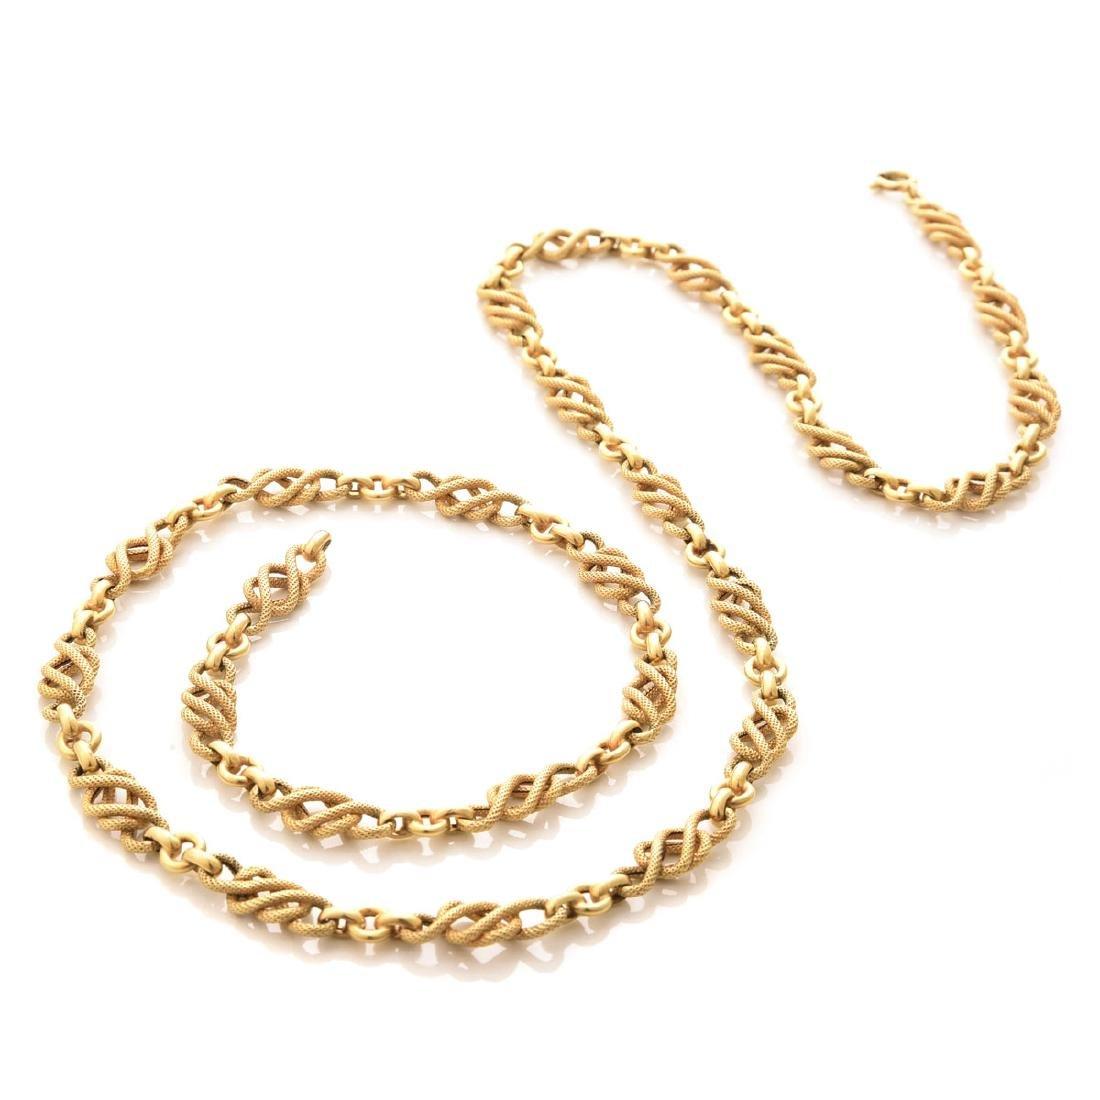 14k Yellow Gold Long Chain.